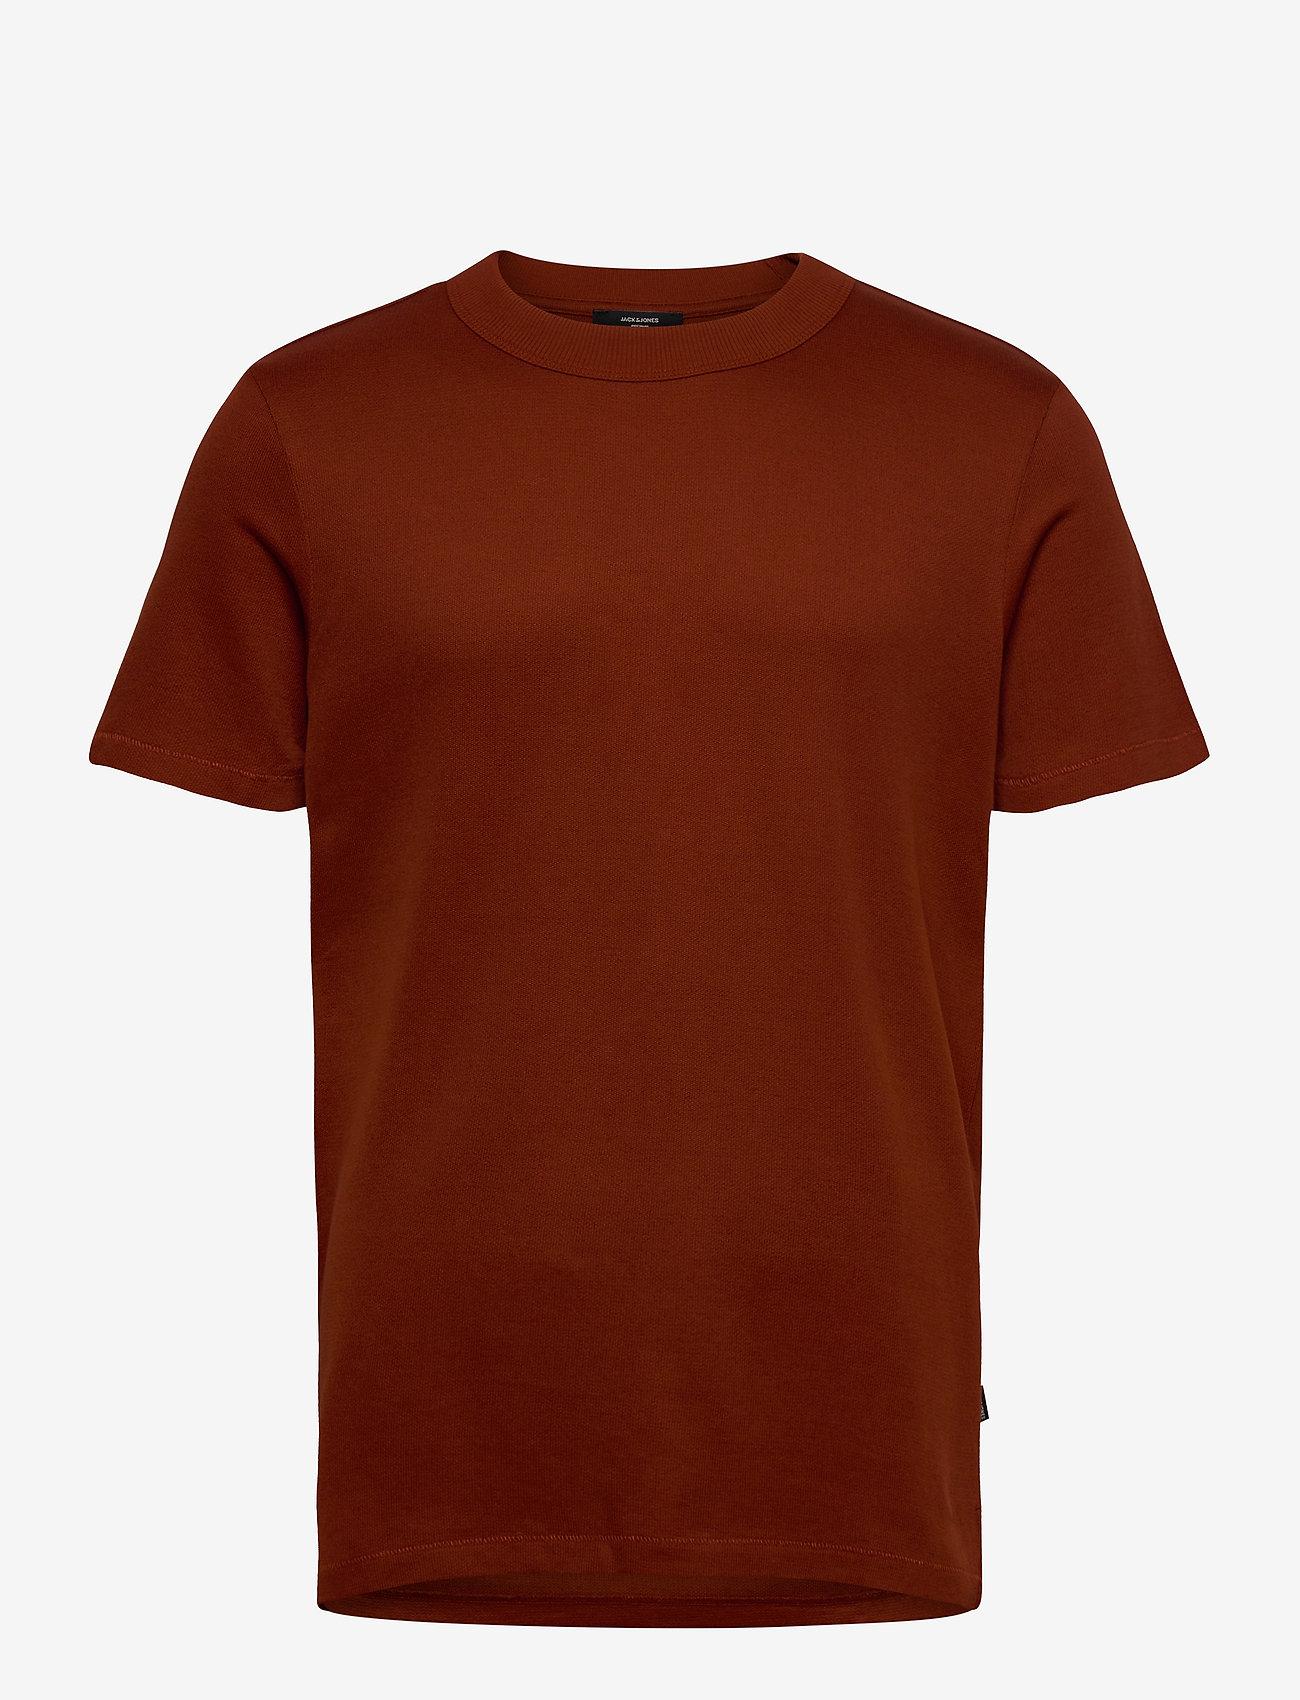 Jack & Jones - JPRRUSHTON BLA. TEE SS CREW NECK - kortärmade t-shirts - dark salamander - 0